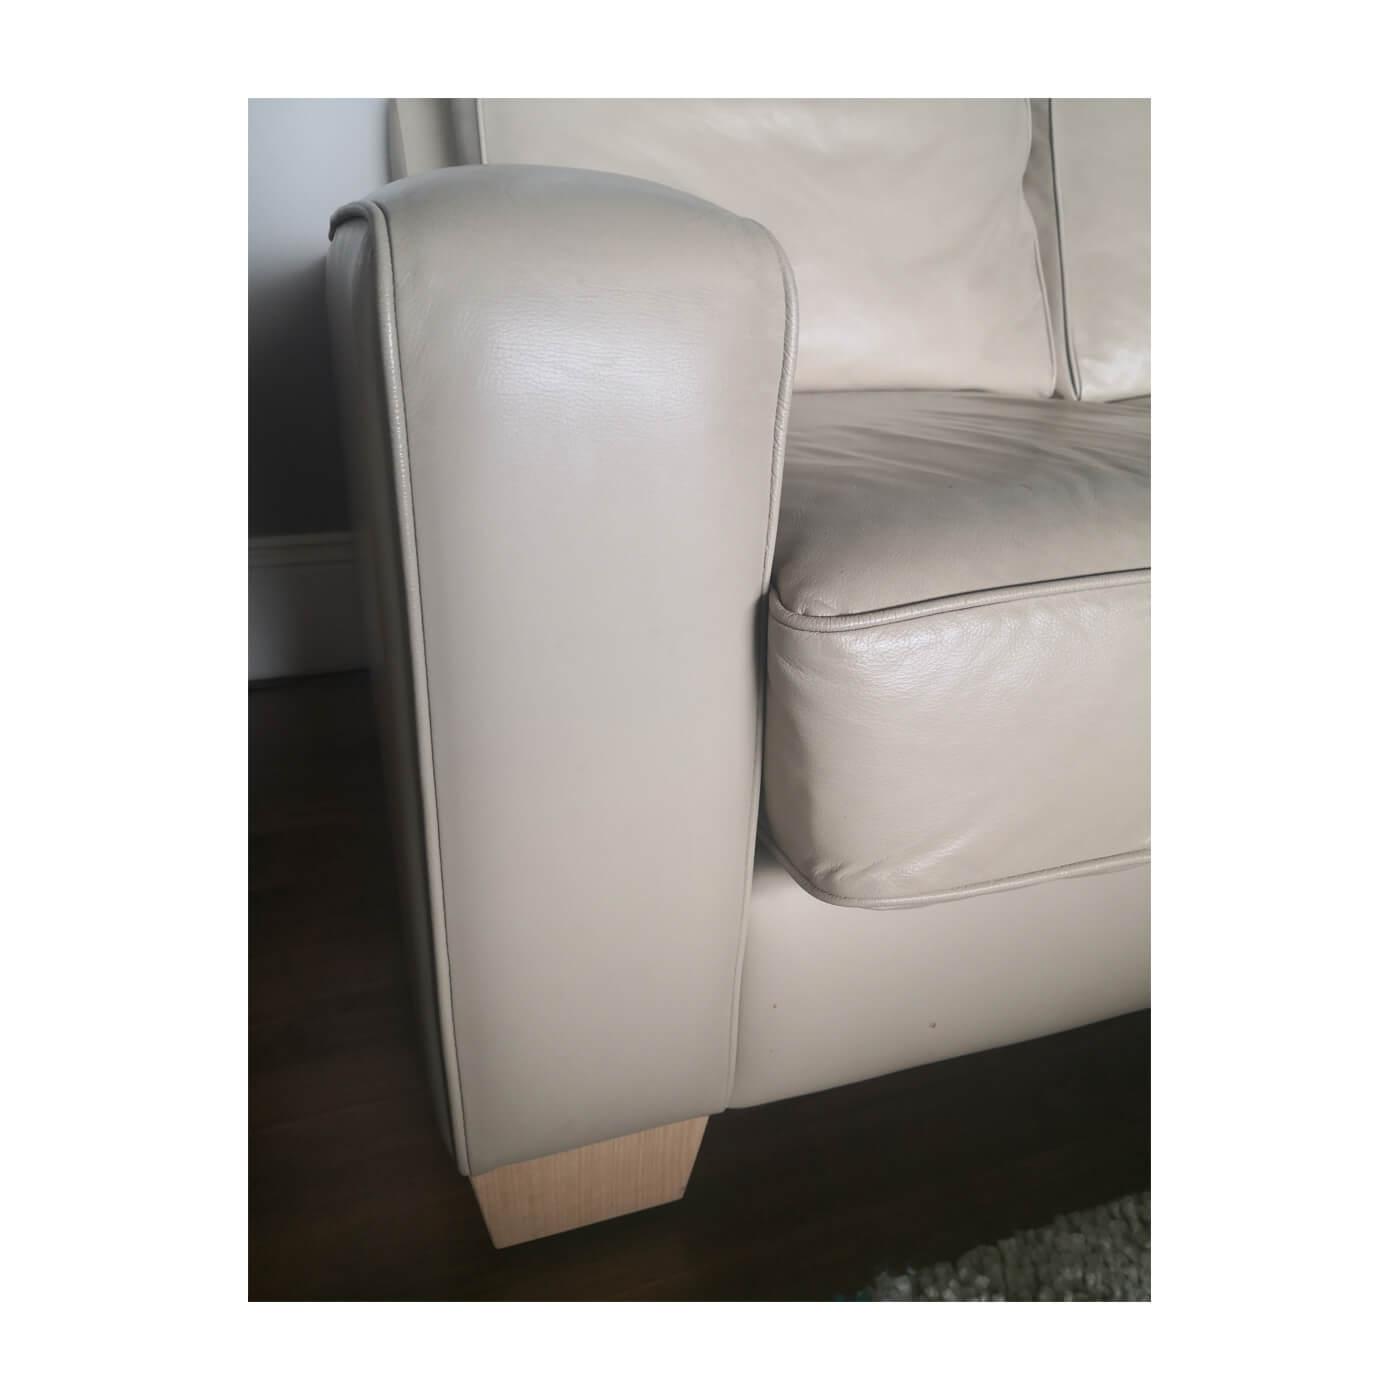 Jardan Sofa, 2 seater inc ream leather, second hand